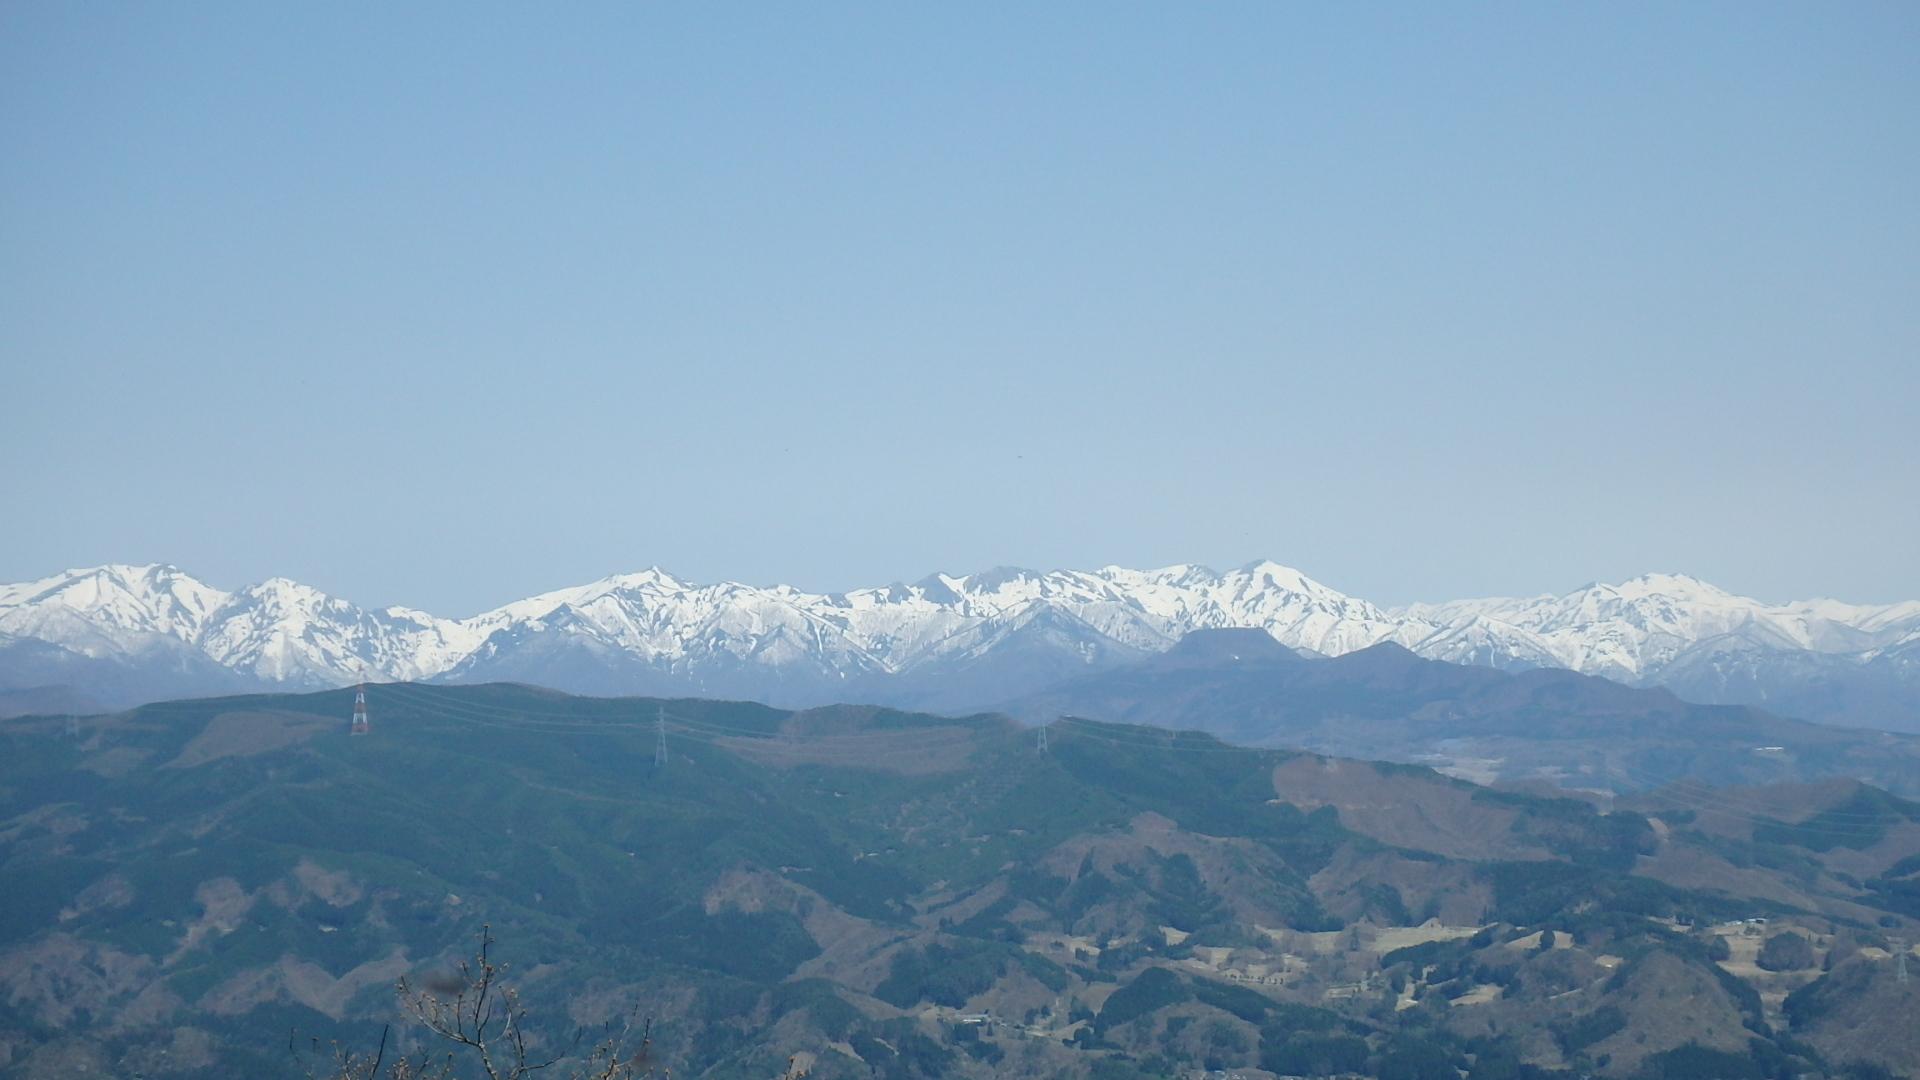 上越国境の山々P4302151